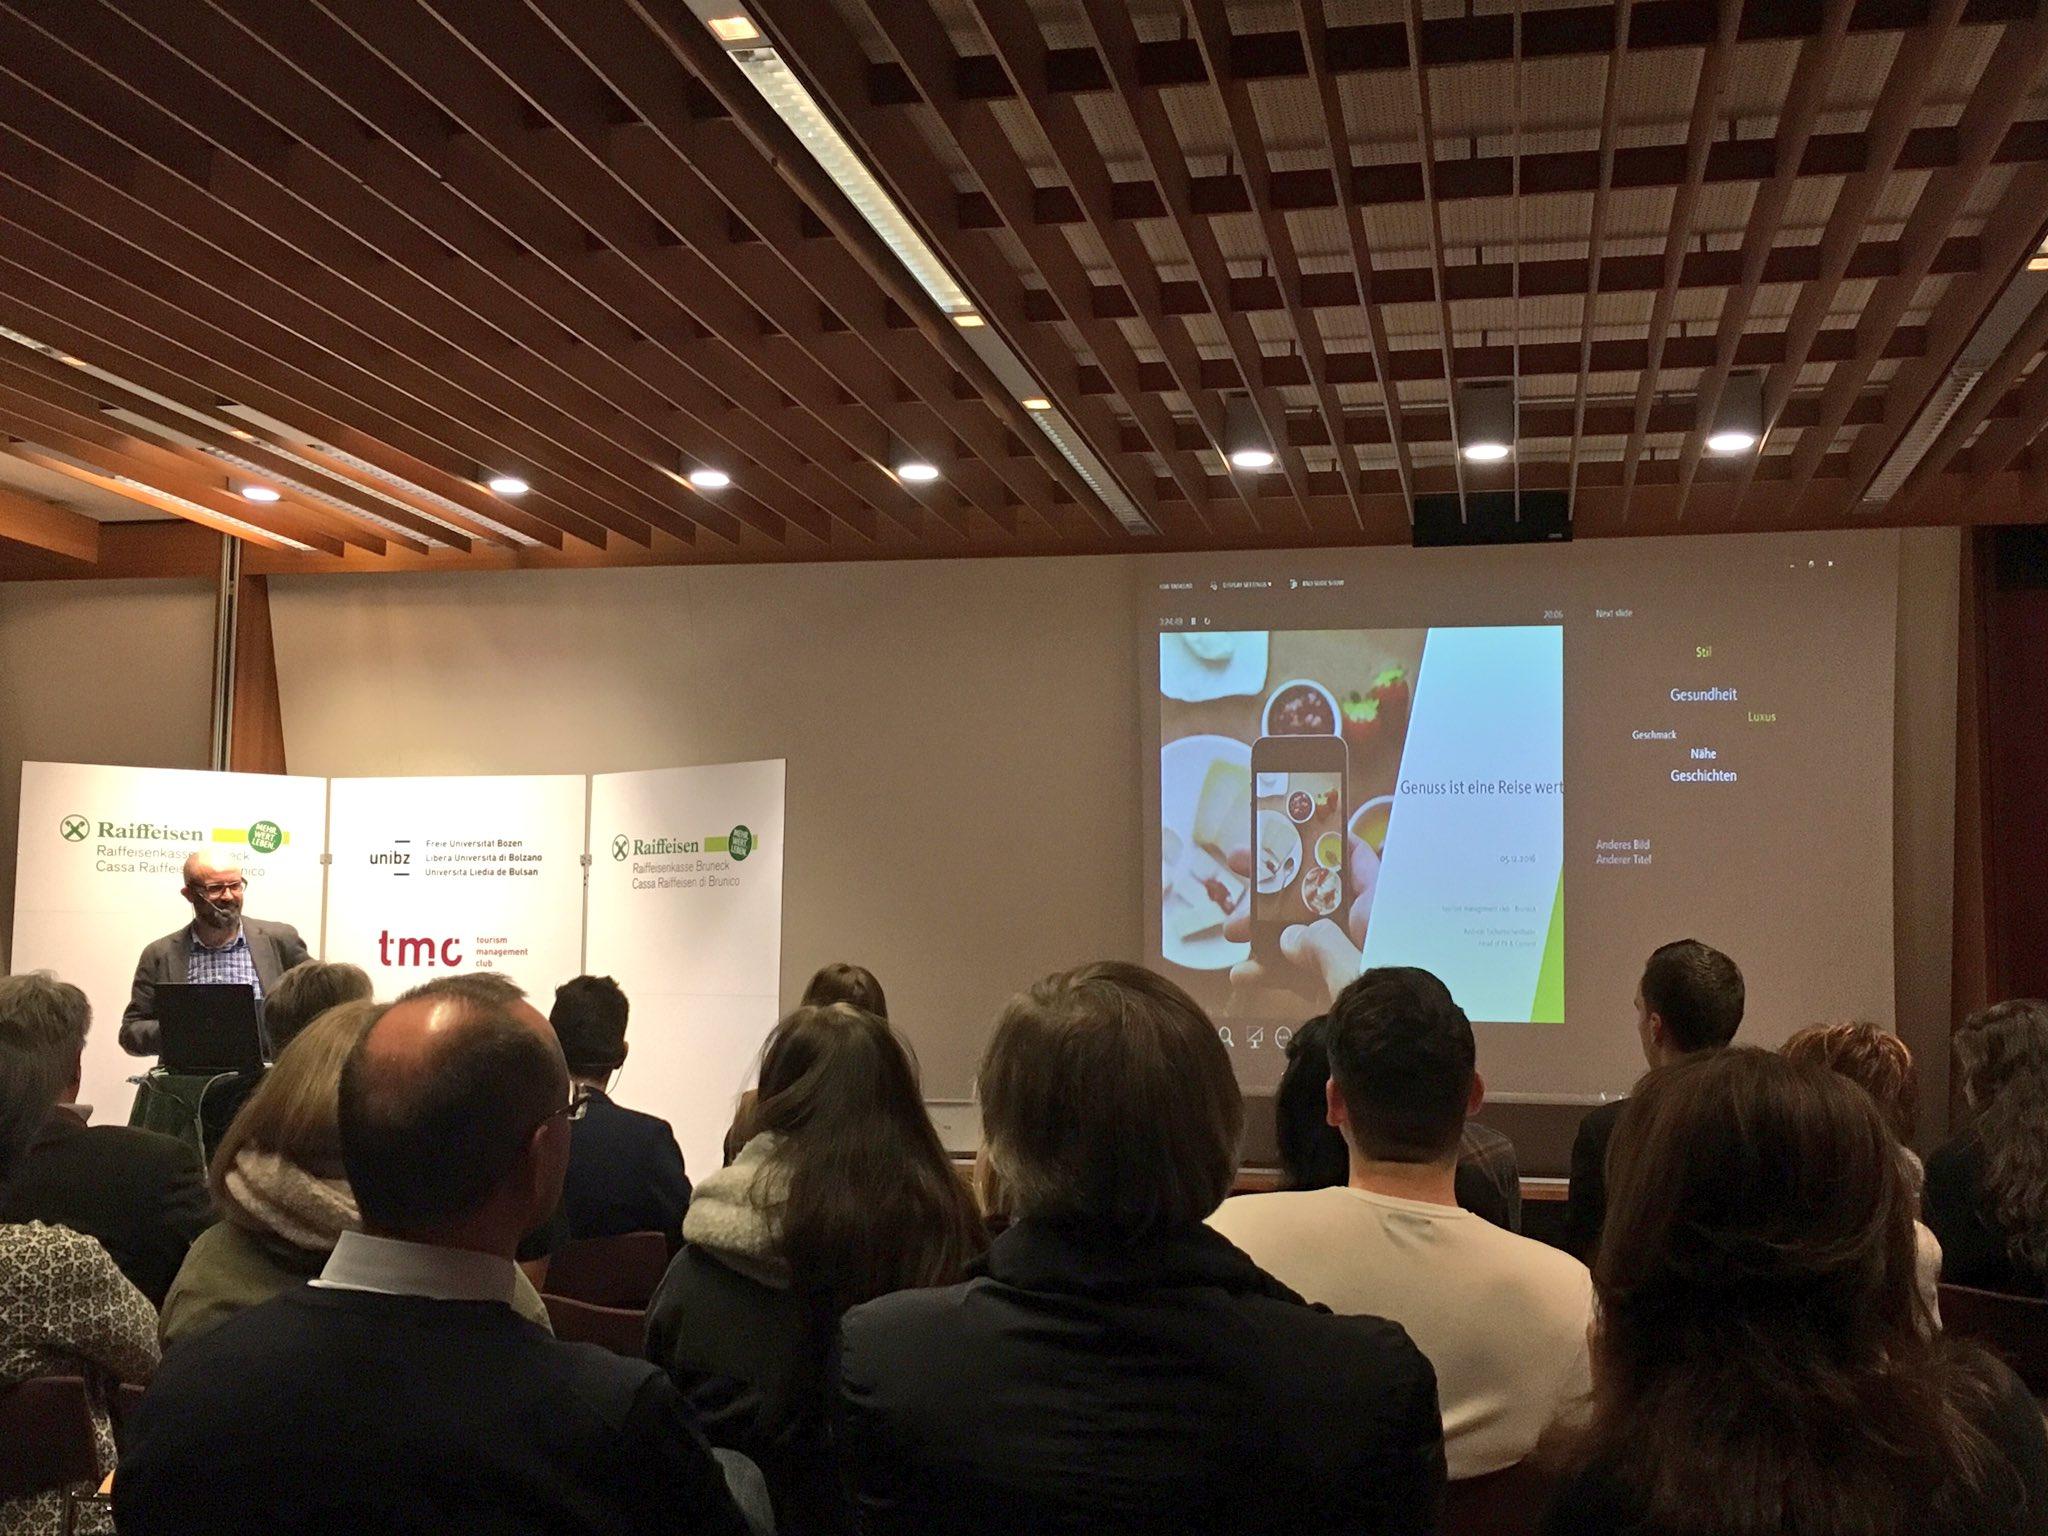 #tmcbz Erster Referent ist Andreas Tschurtschenthaler @Andreastsch, Head of PR & Content bei @IDM_suedtirol. https://t.co/zuLs02mZyk